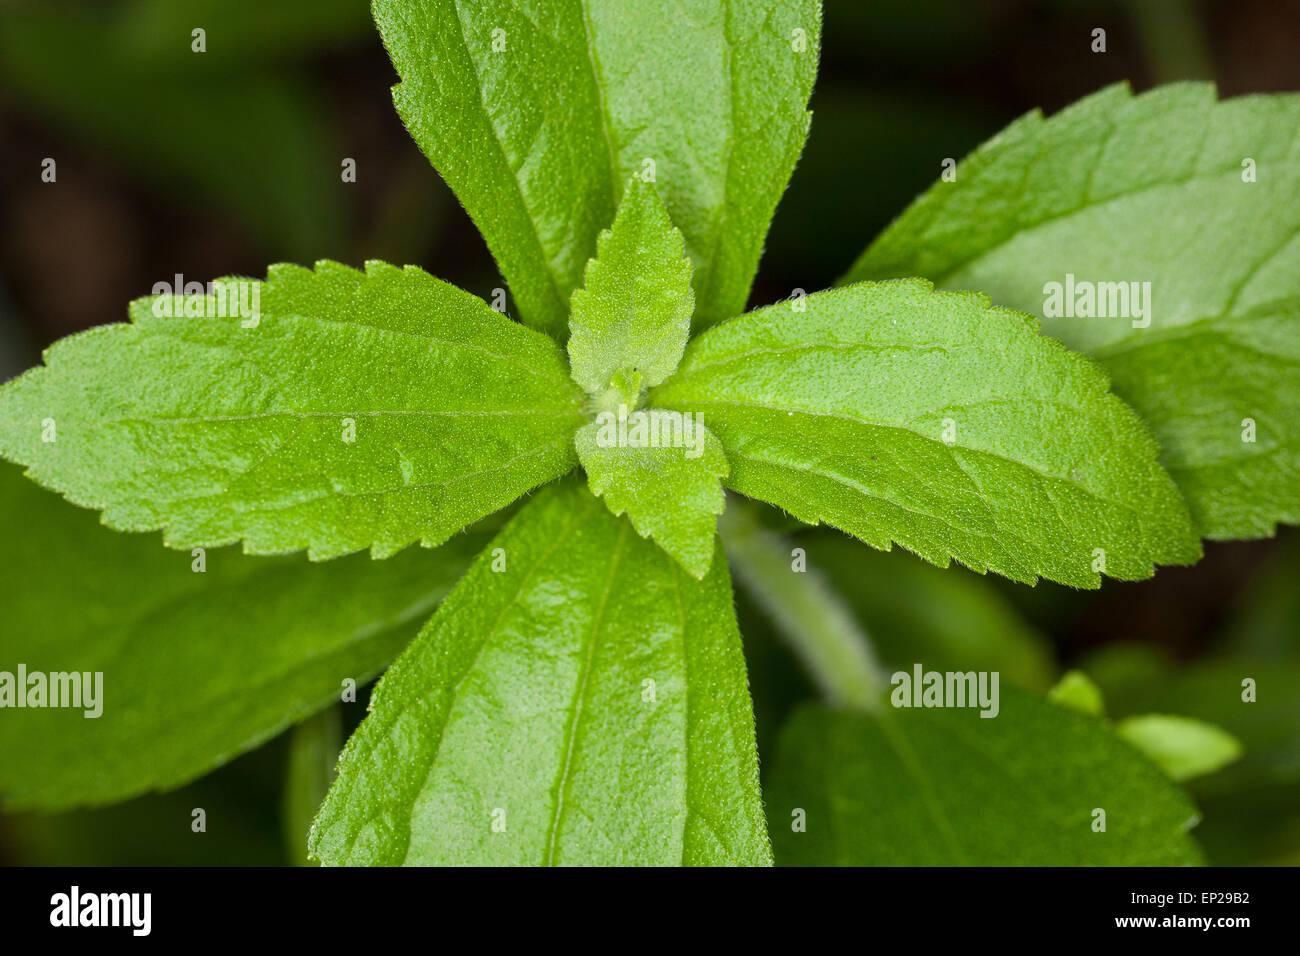 Sweet Leaf of Paraguay, Stevia, Stevie, Stewia, Süßkraut, Zuckerblatt, Stevia-Pflanze, Stevia rebaudiana, - Stock Image